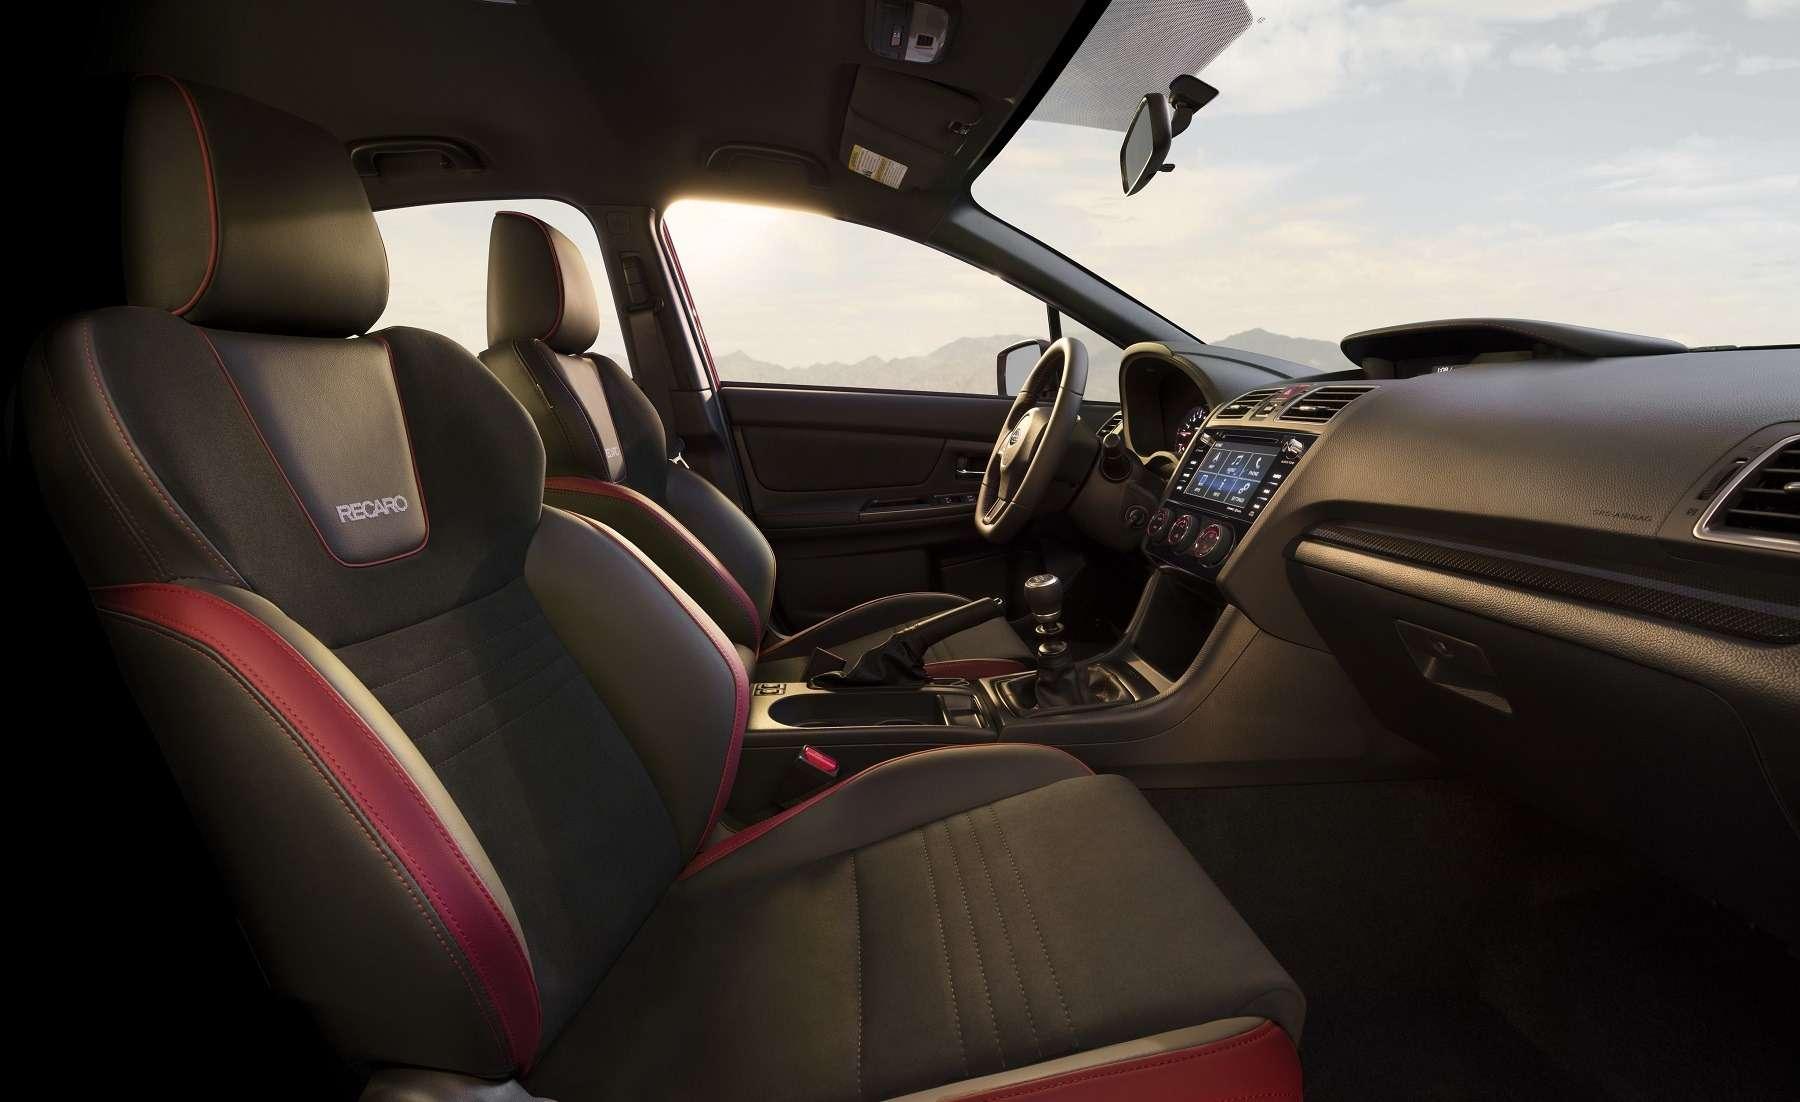 Электронный разум: Subaru WRX иWRX STI обновились— фото 689996